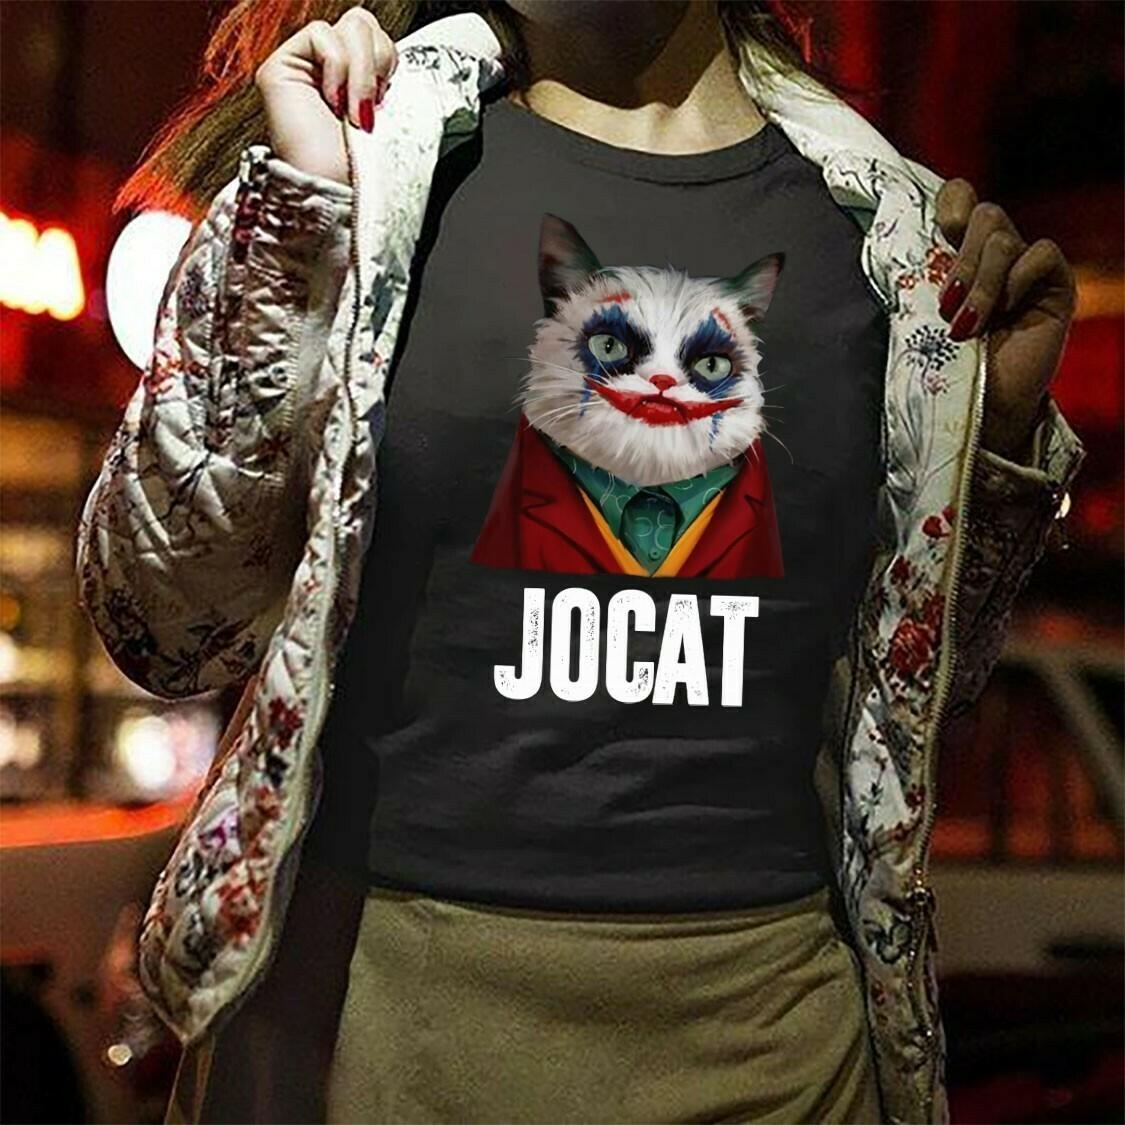 Funny Kitty Cat Cosplay Jocat Joker Movie 2019 Gifts For Fans Here Comes Your Favorite Villain Hero Halloween Movie Mashup Unisex T-Shirt Long Sleeve Sweatshirt Hoodie Jolly Family Gifts